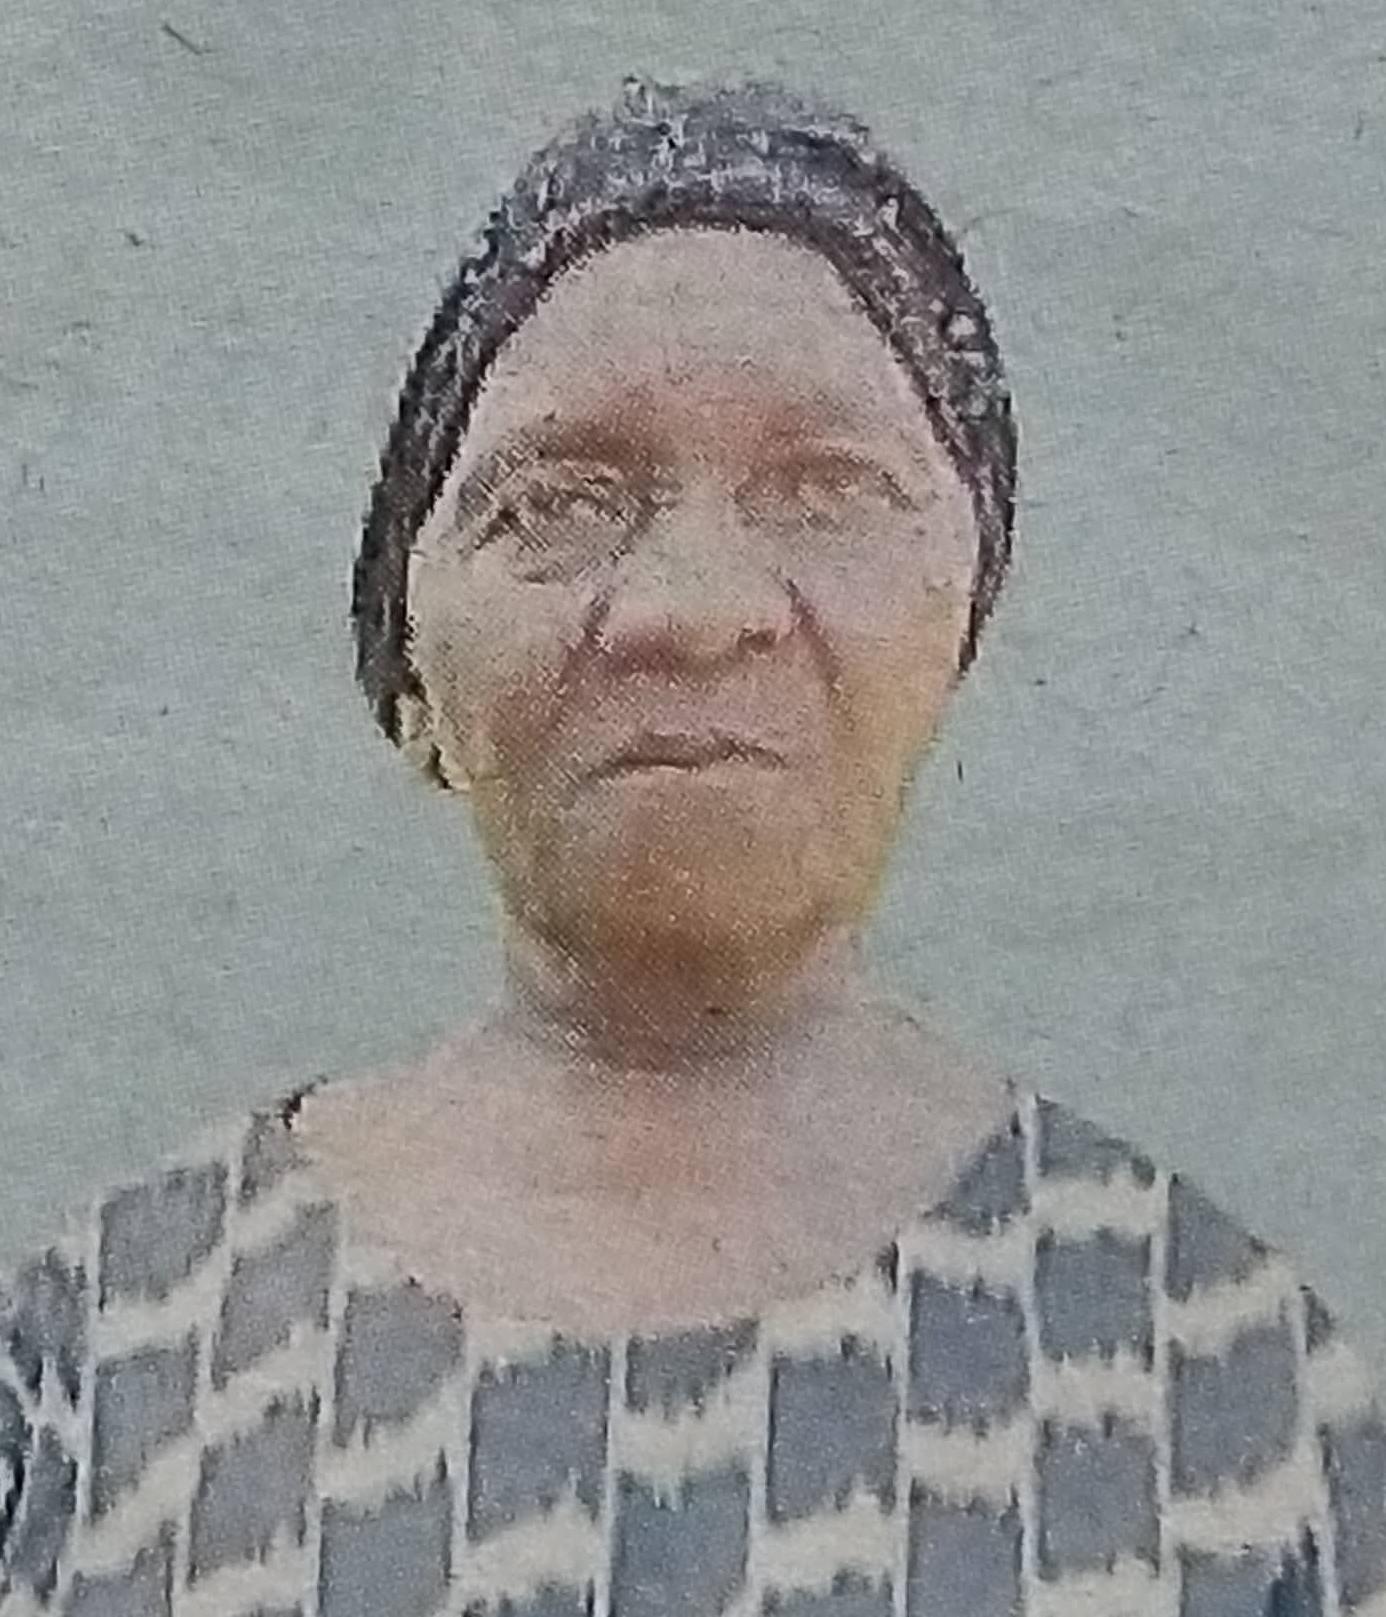 Florence Wambui Njora - Obituary Kenya